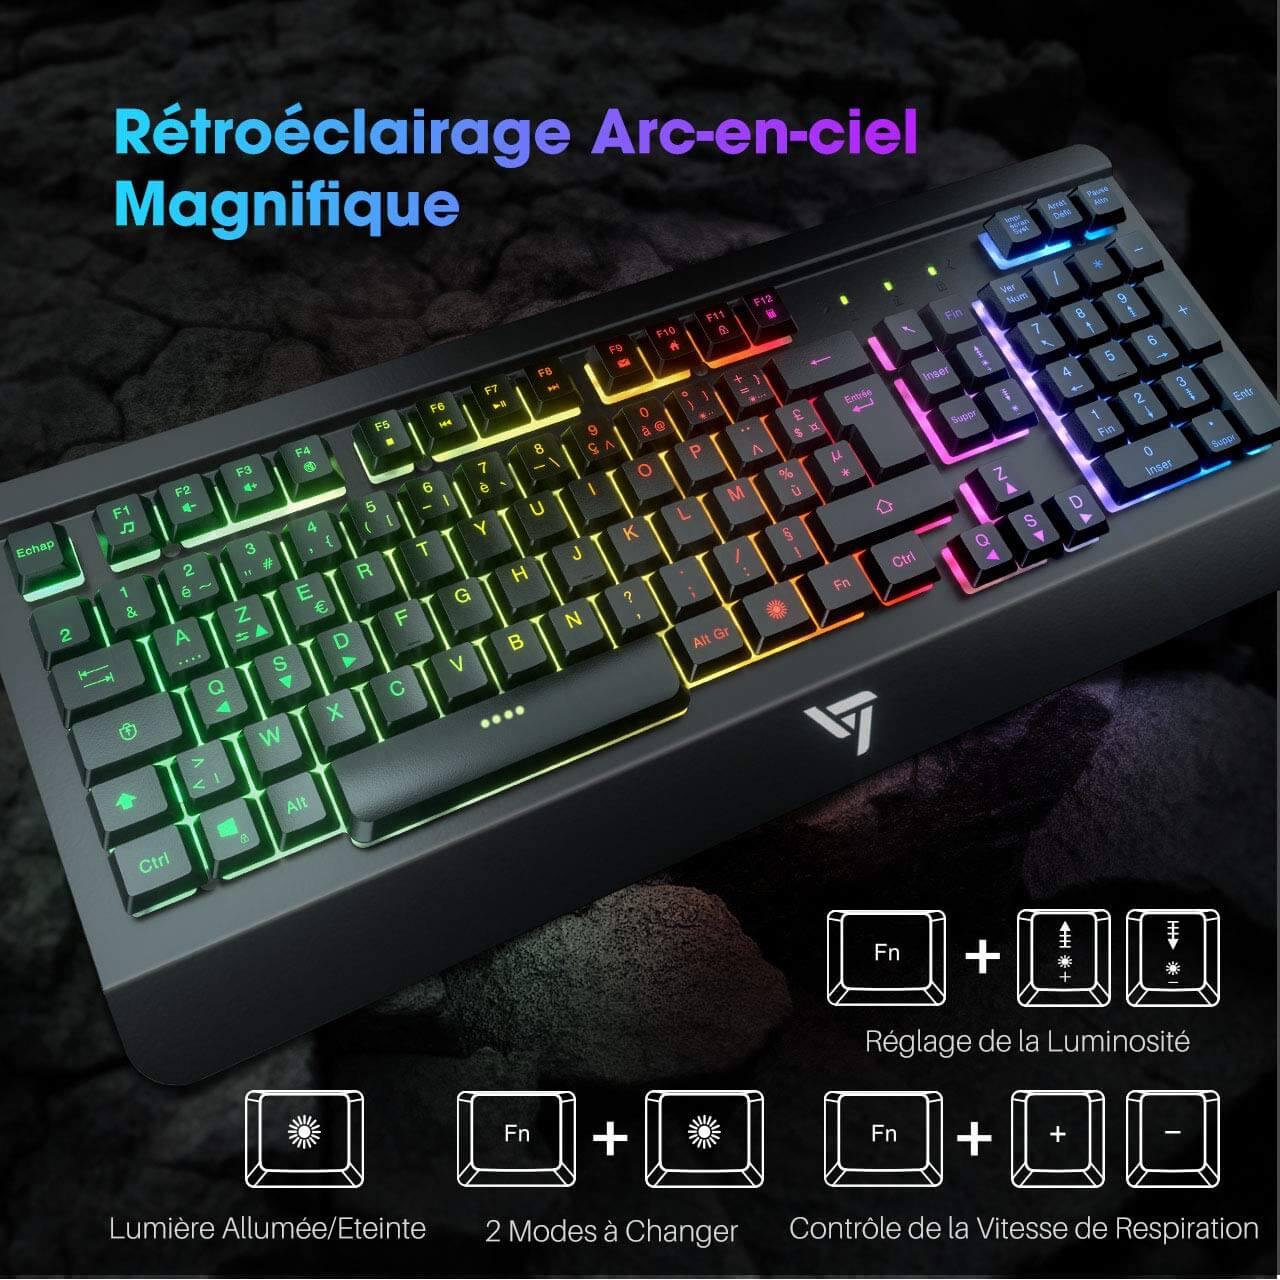 Meilleur clavier gamer pas cher